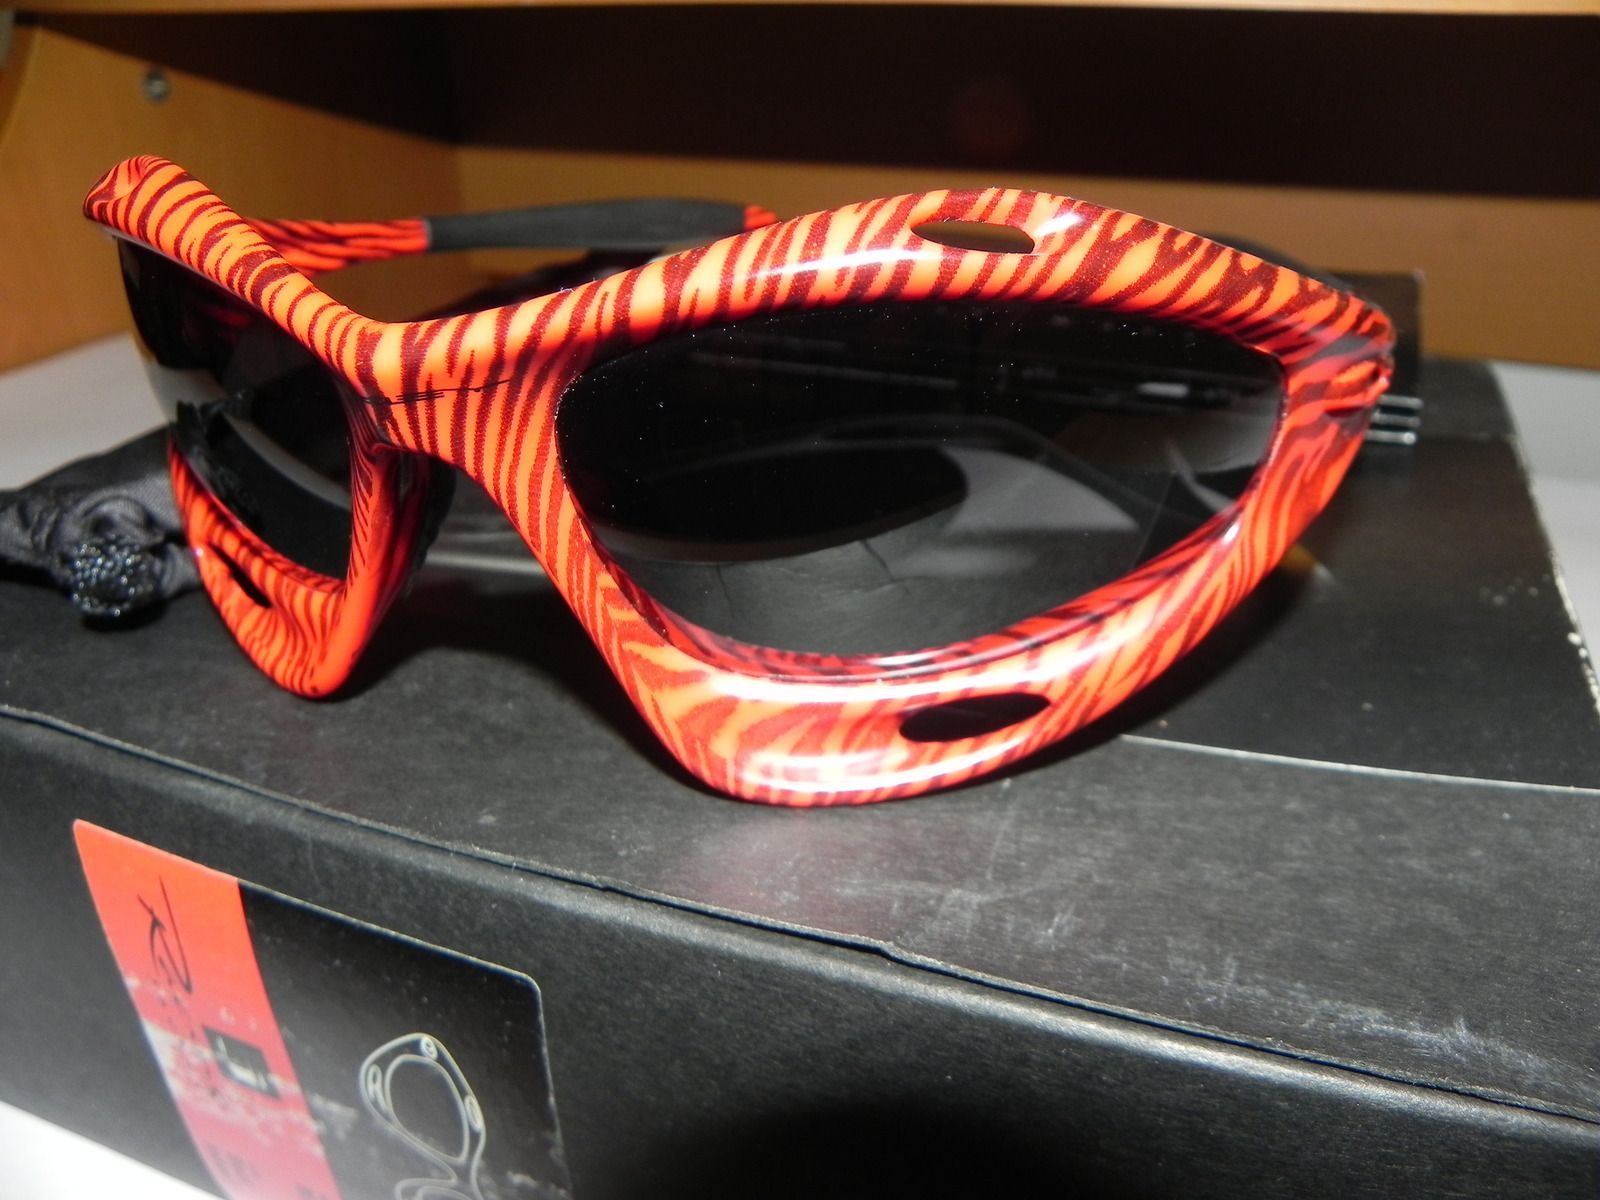 Red Tiger Racing Jacket With Box - DSCN3699_www.kepfeltoltes.hu_.jpg